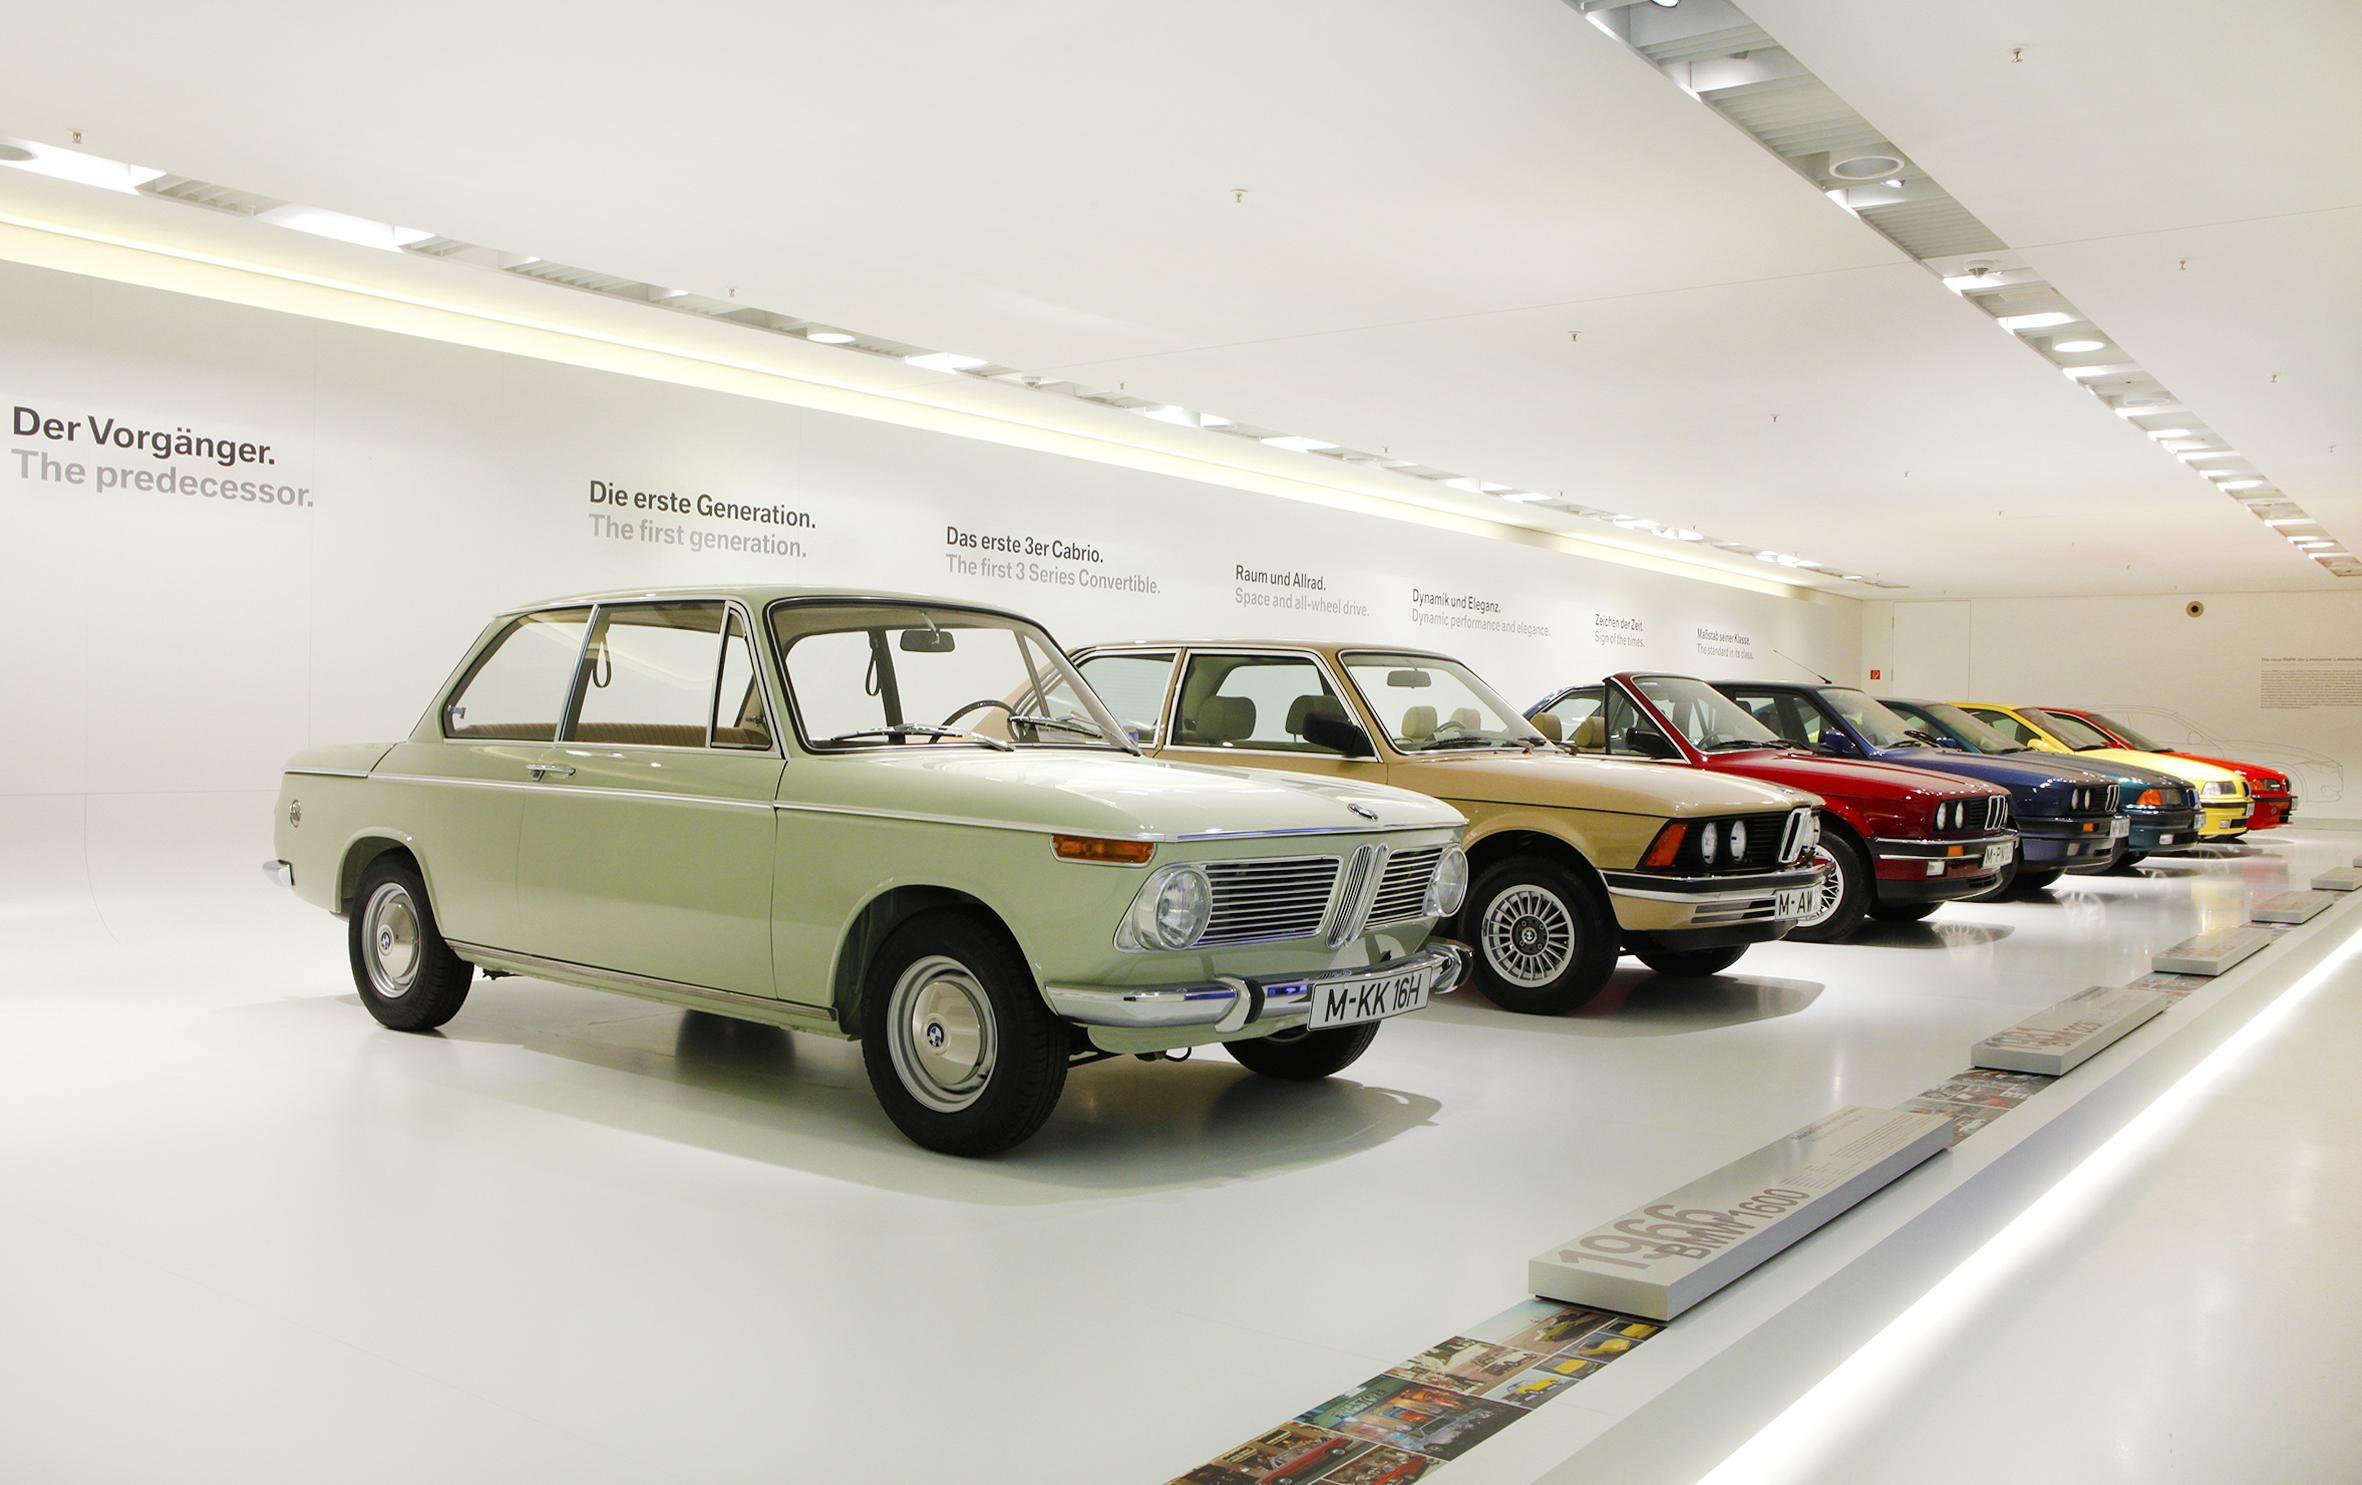 Luxury Bmw Cars 21 Hd Wallpaper